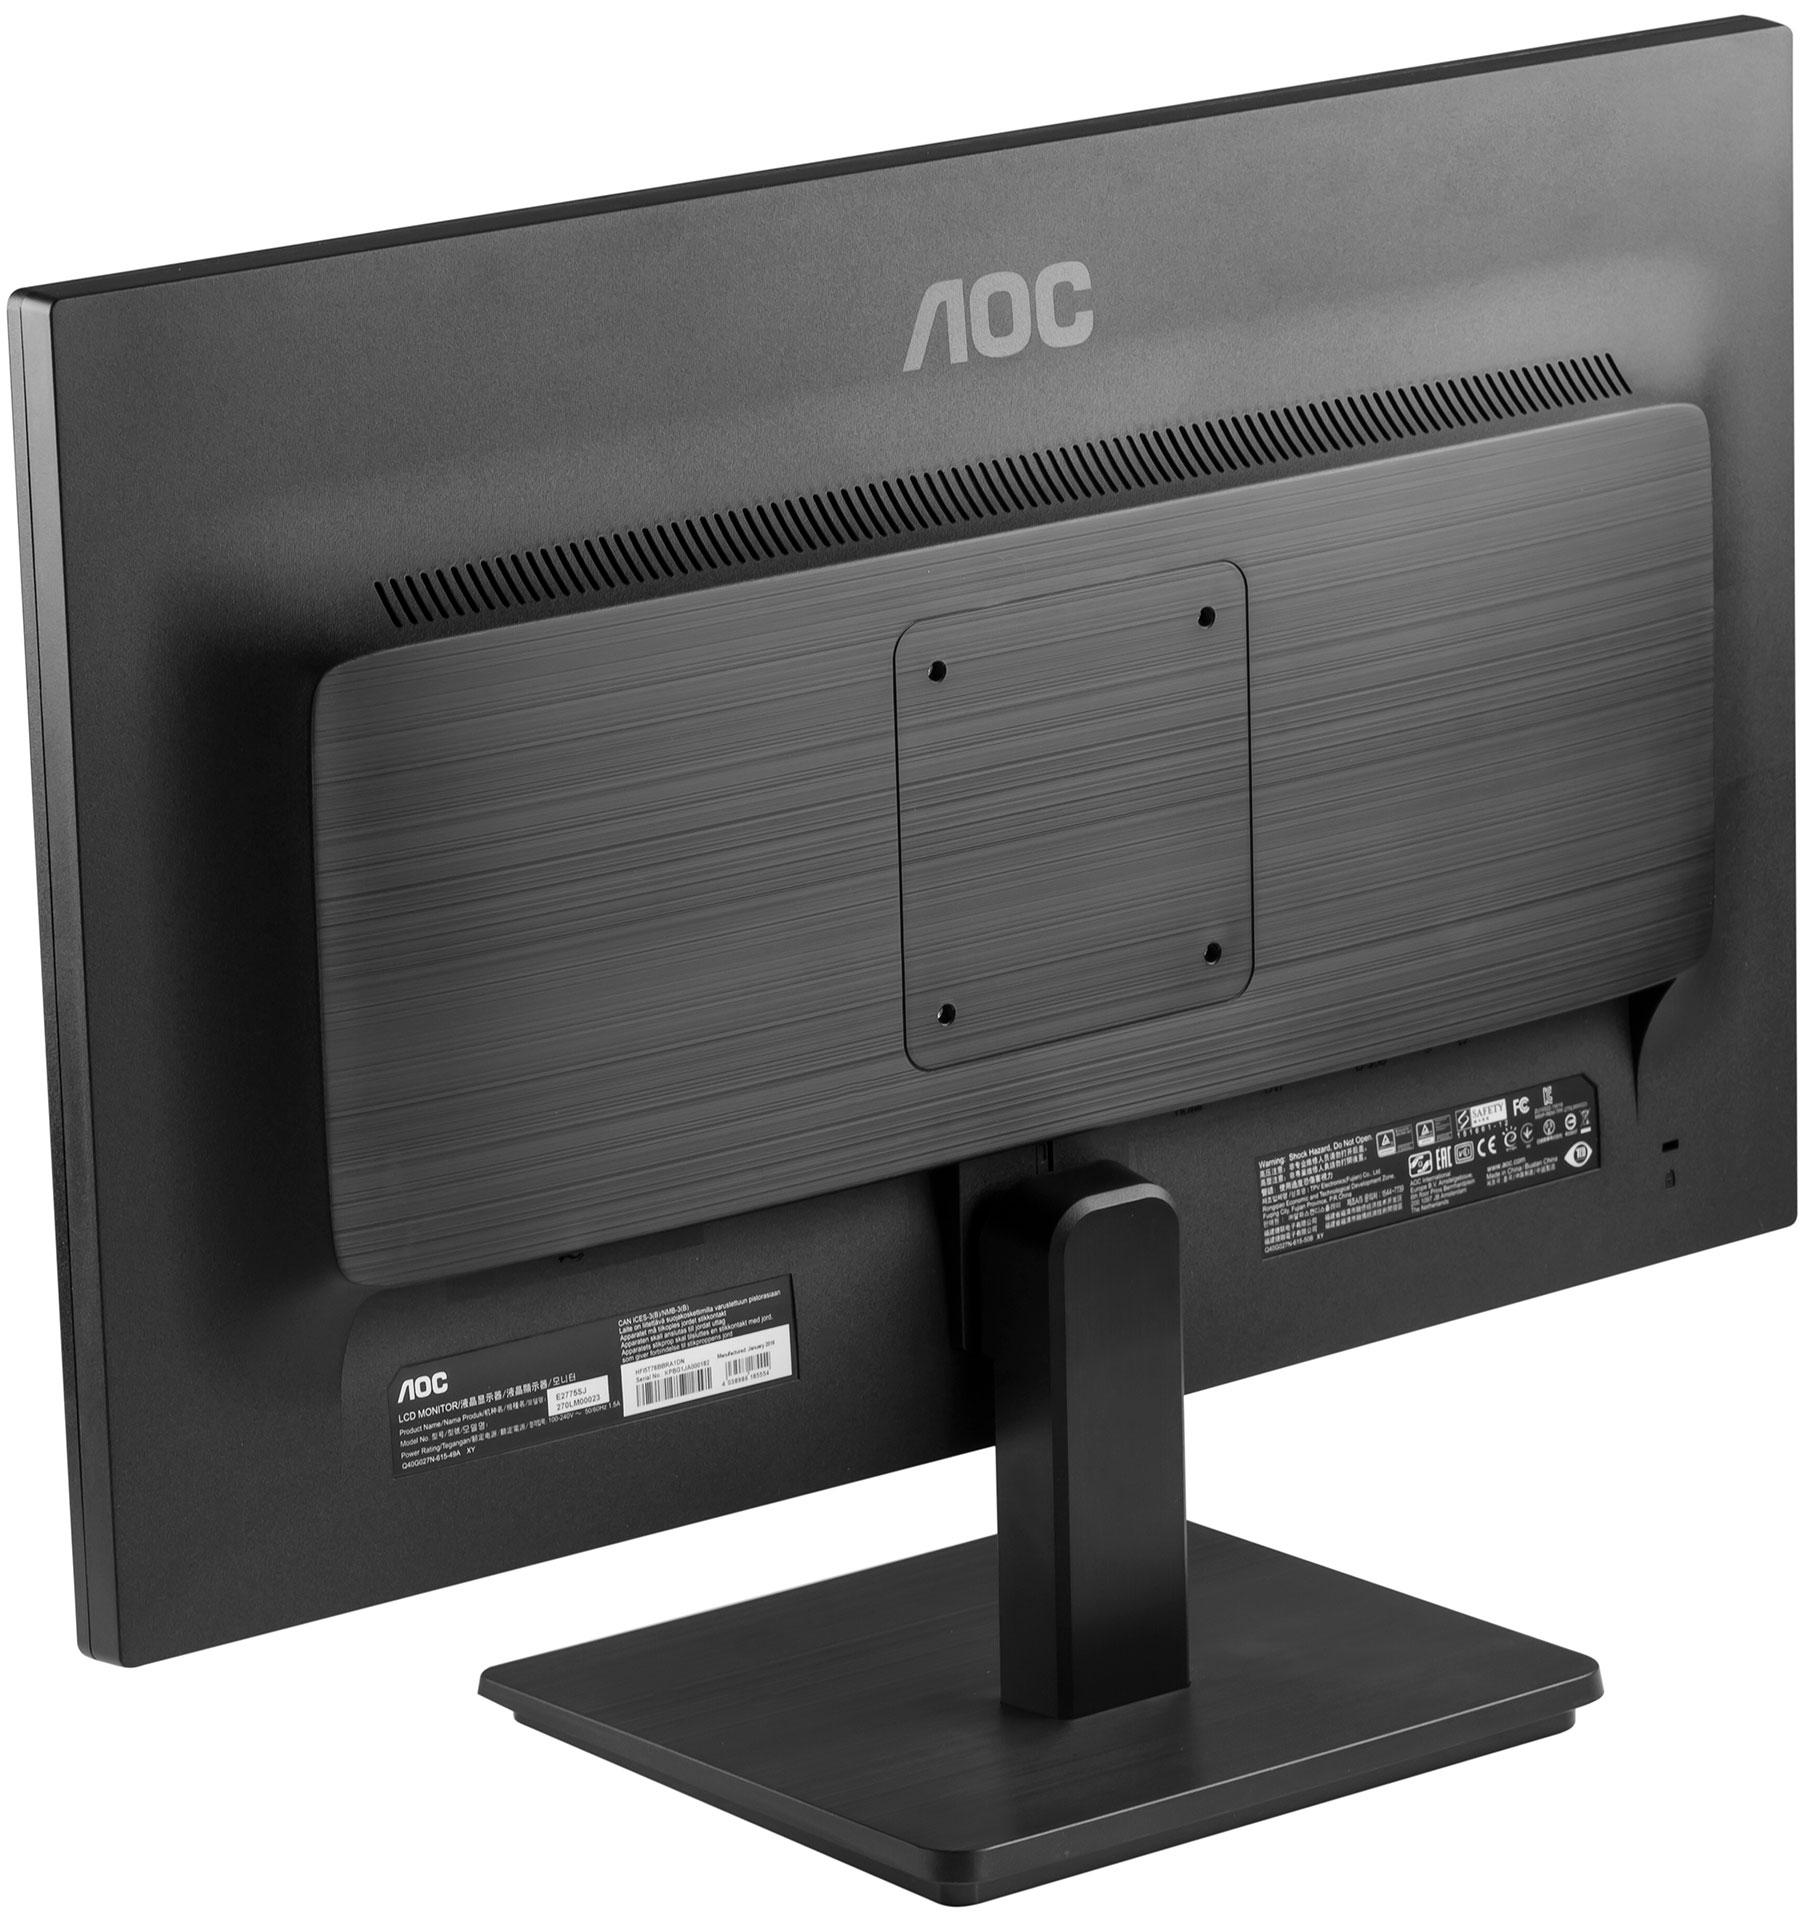 Монитор бизнес-класса: обзор 27-дюймового AOC E2775SJ